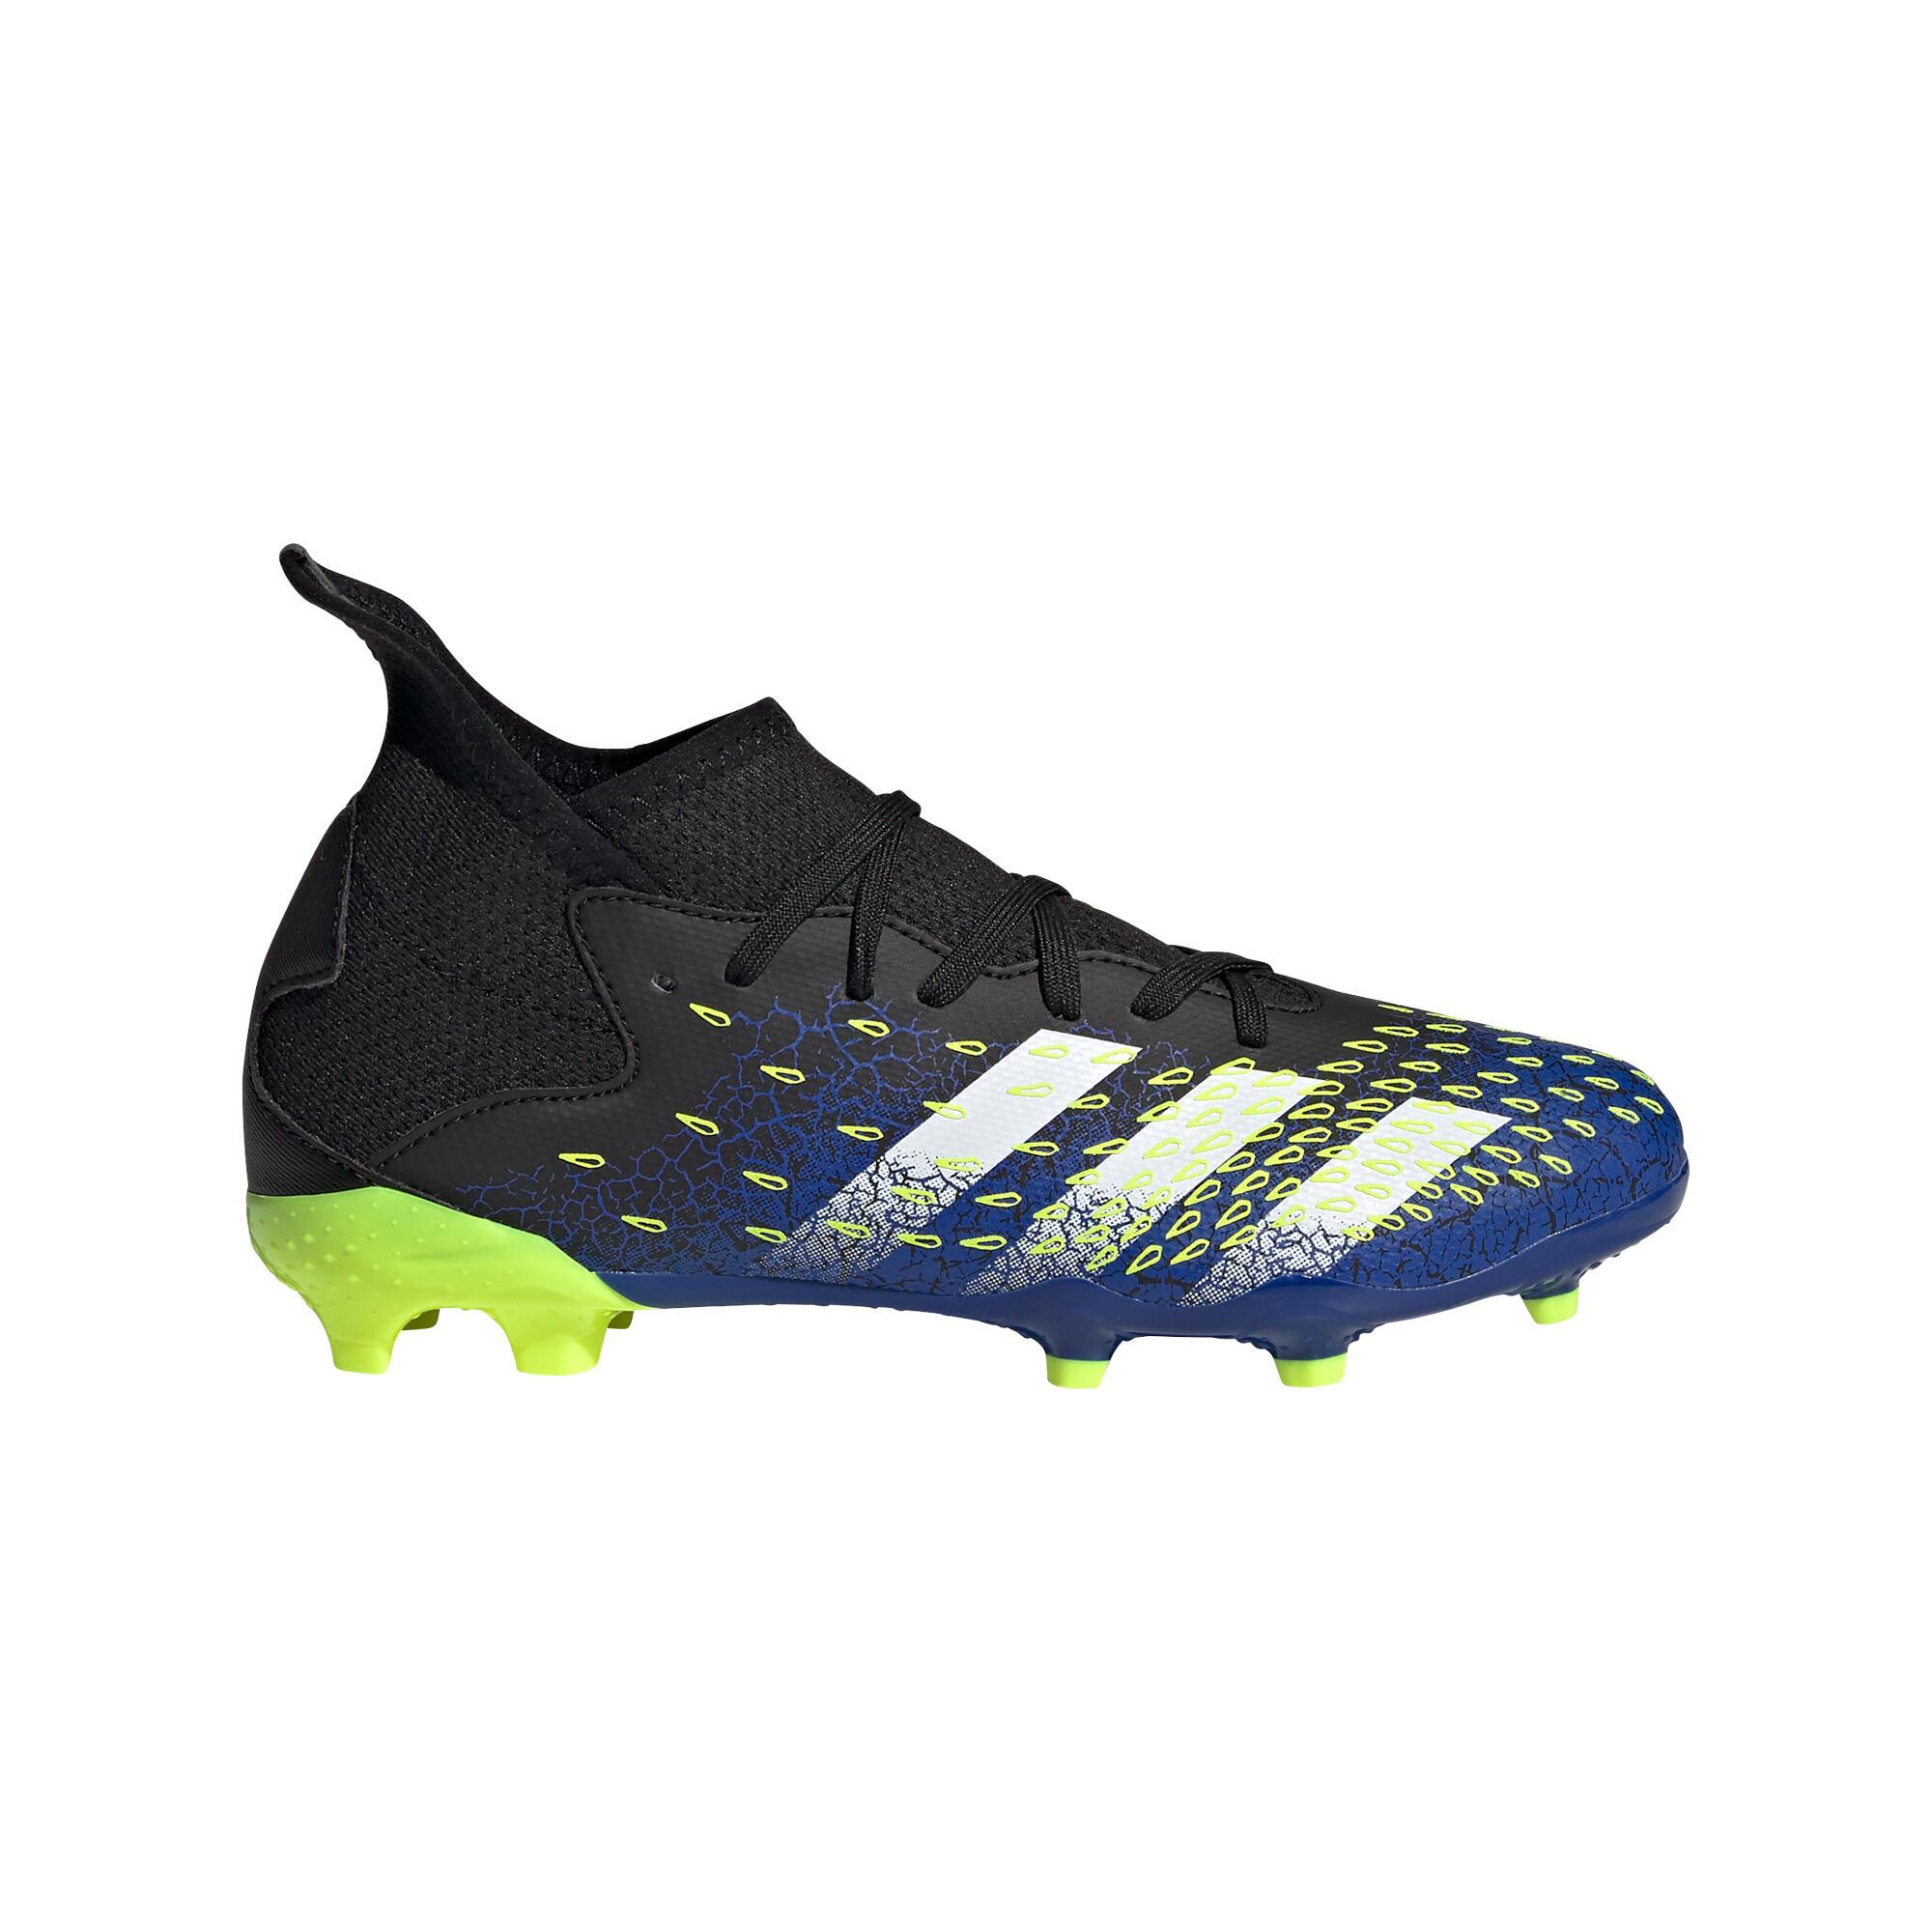 Chaussures de football Predator Freak .3 FG adidas enfant